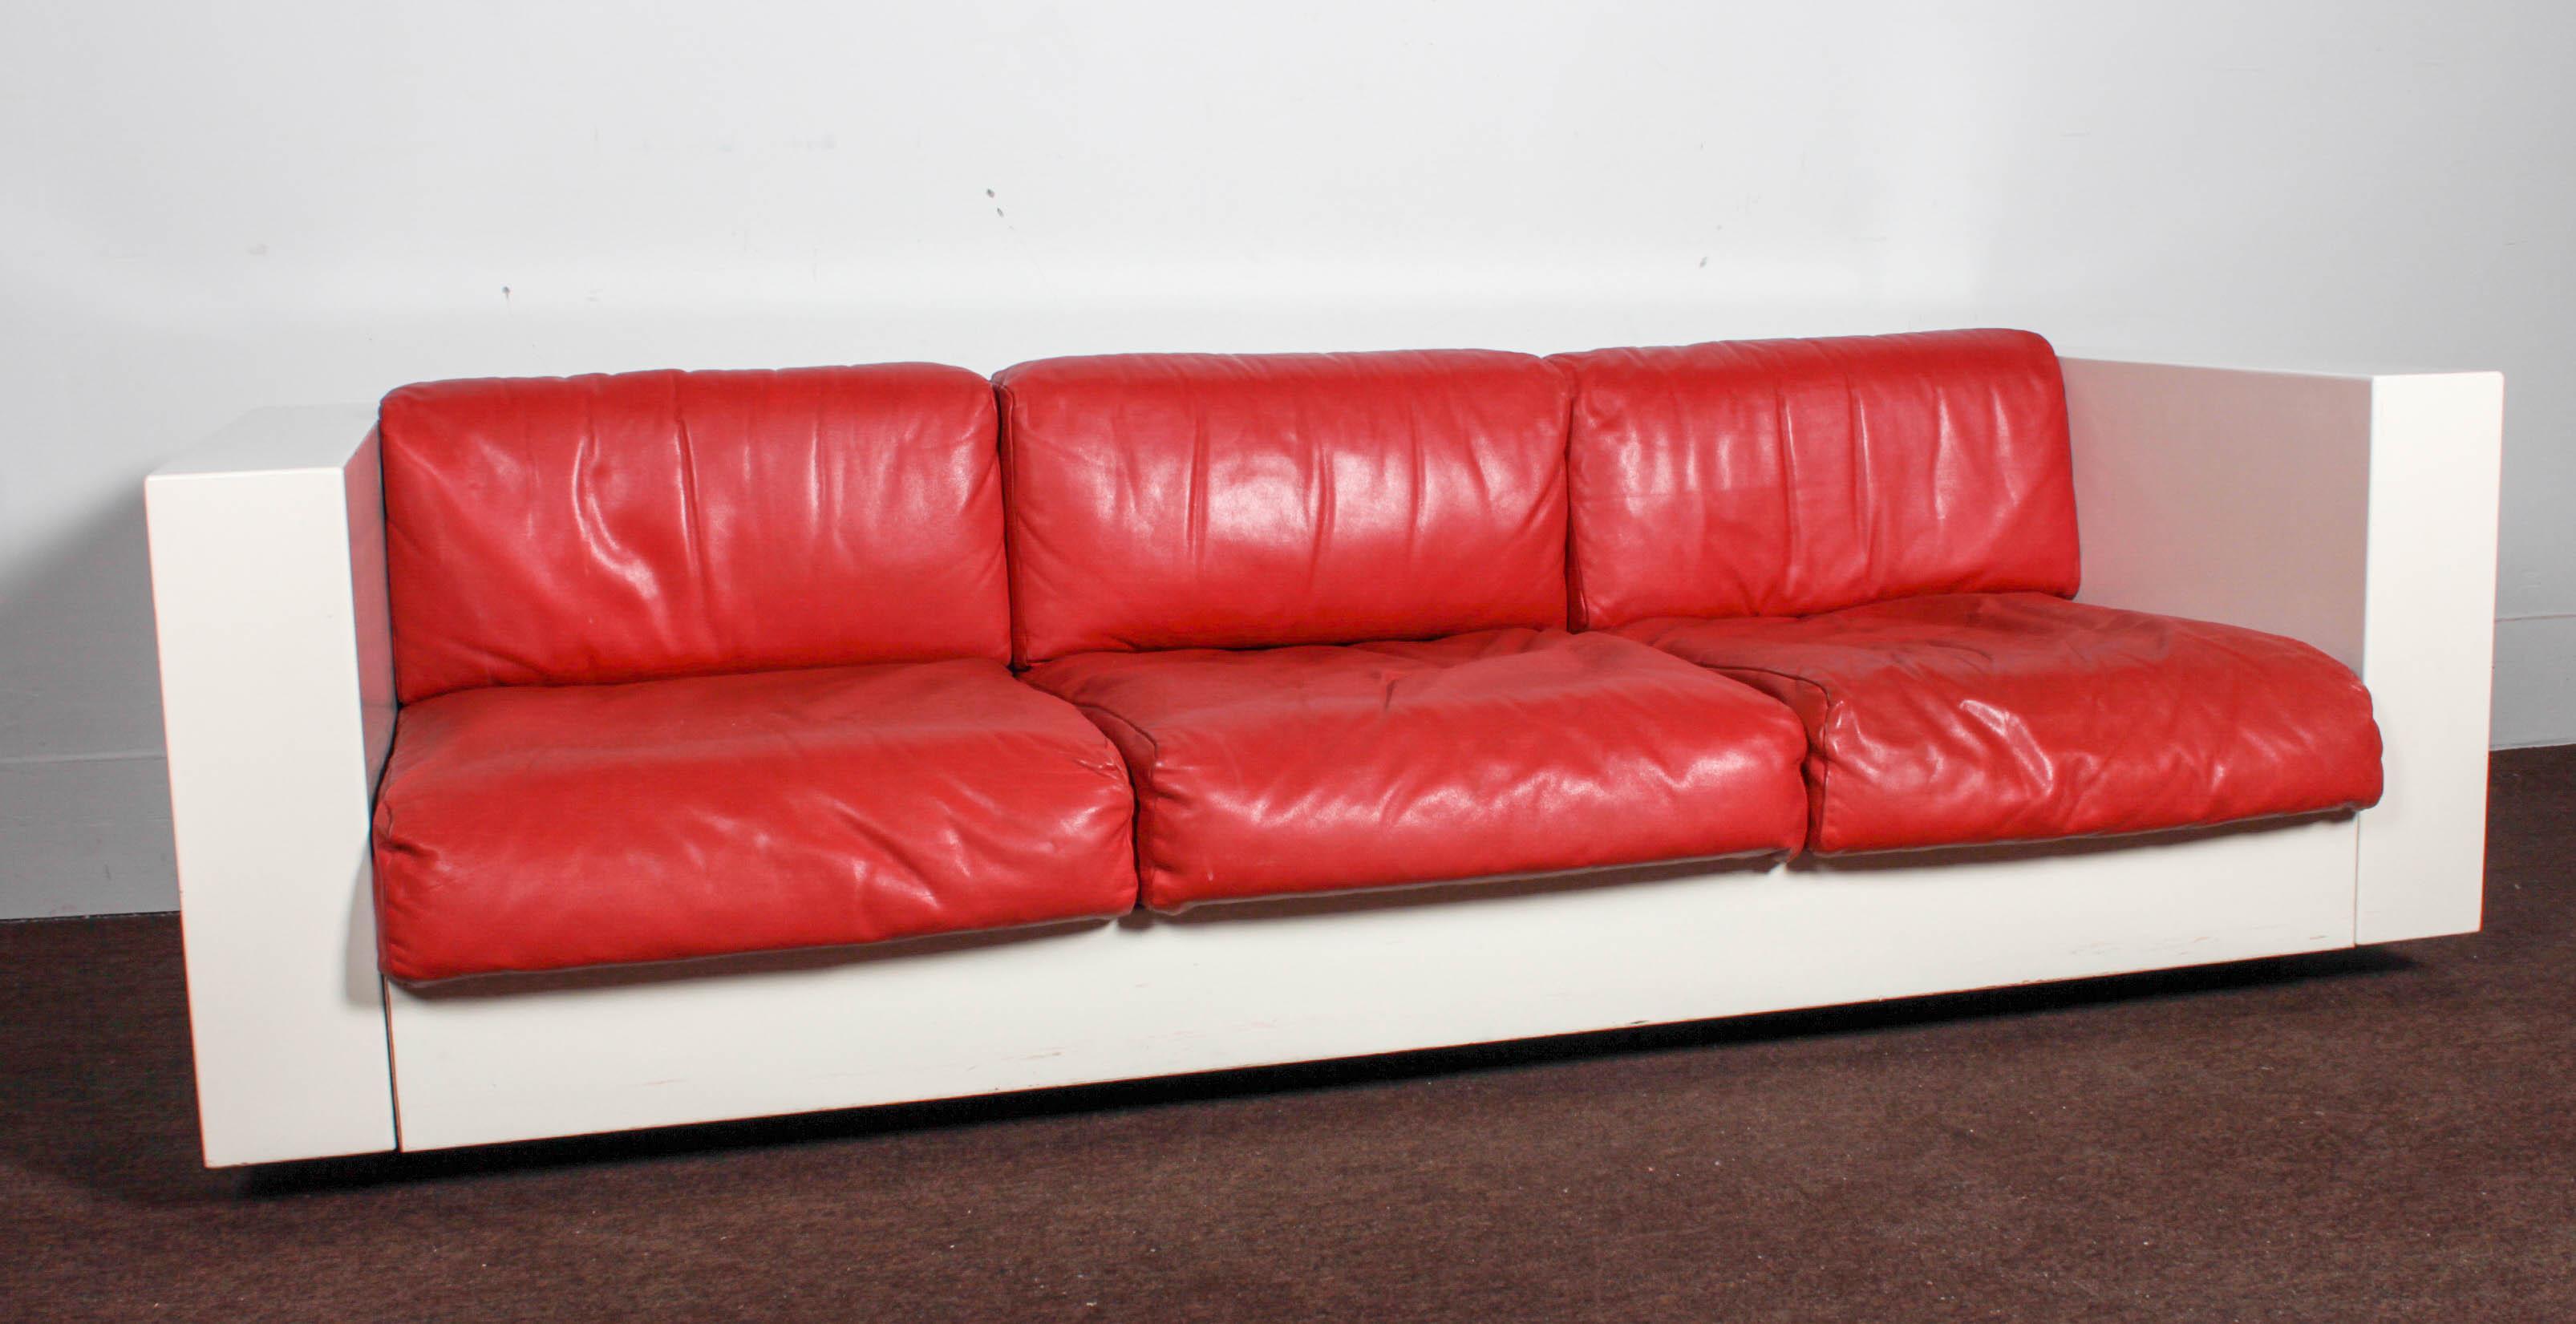 Massimo Vignelli For Poltronova Saratoga Red Leather Sofas   A Pair   Image  3 Of 11